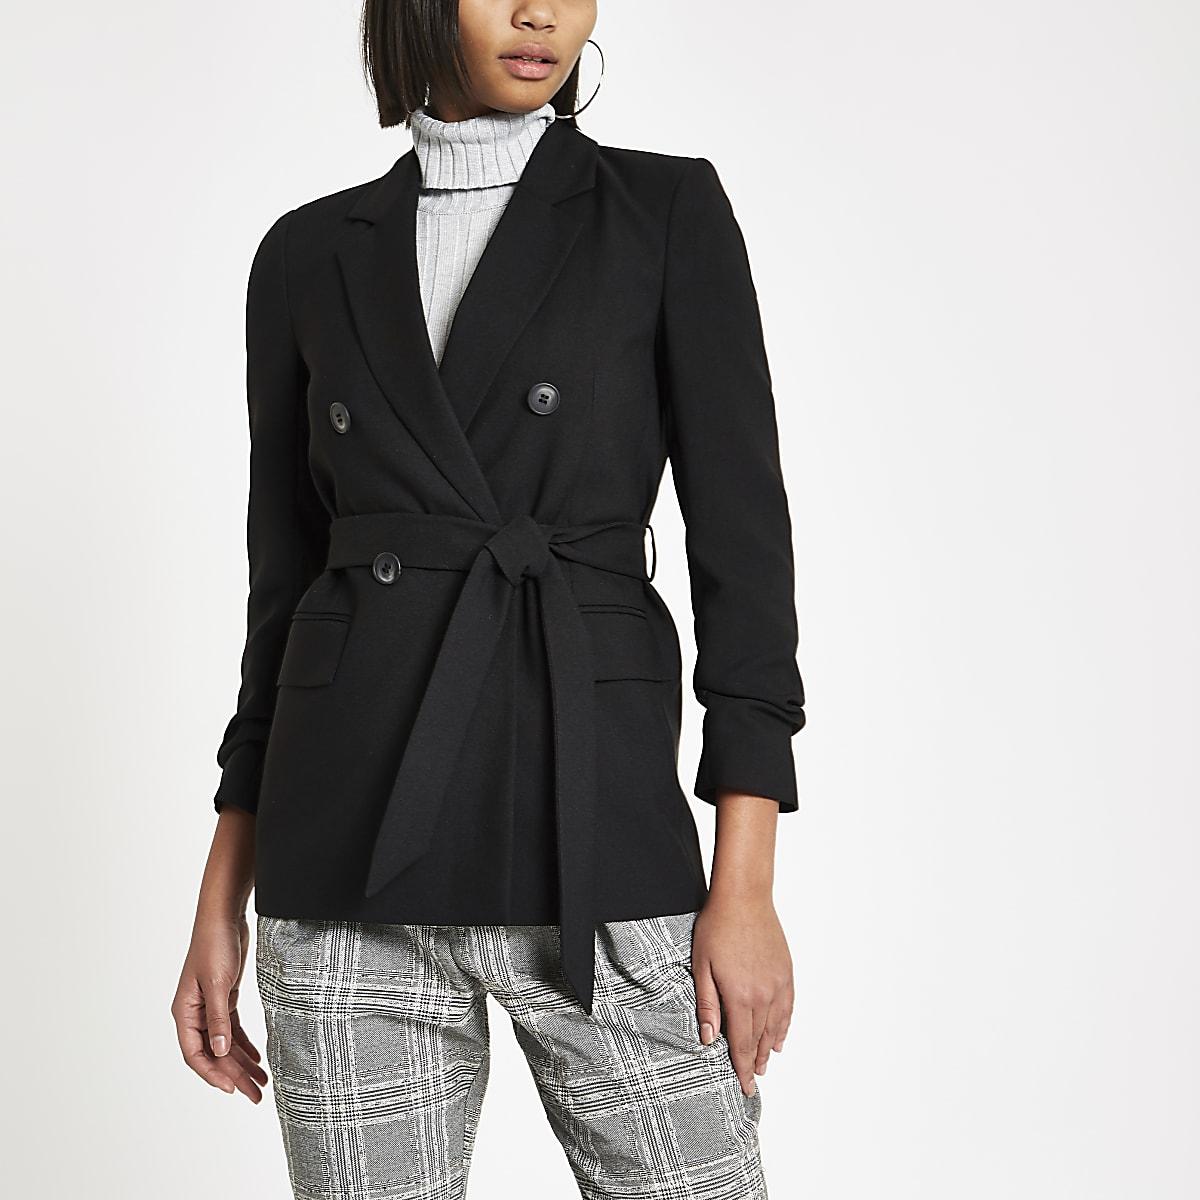 bbaa4b16b8a38 Black tie waist ruched sleeve blazer - Blazers - Coats   Jackets - women